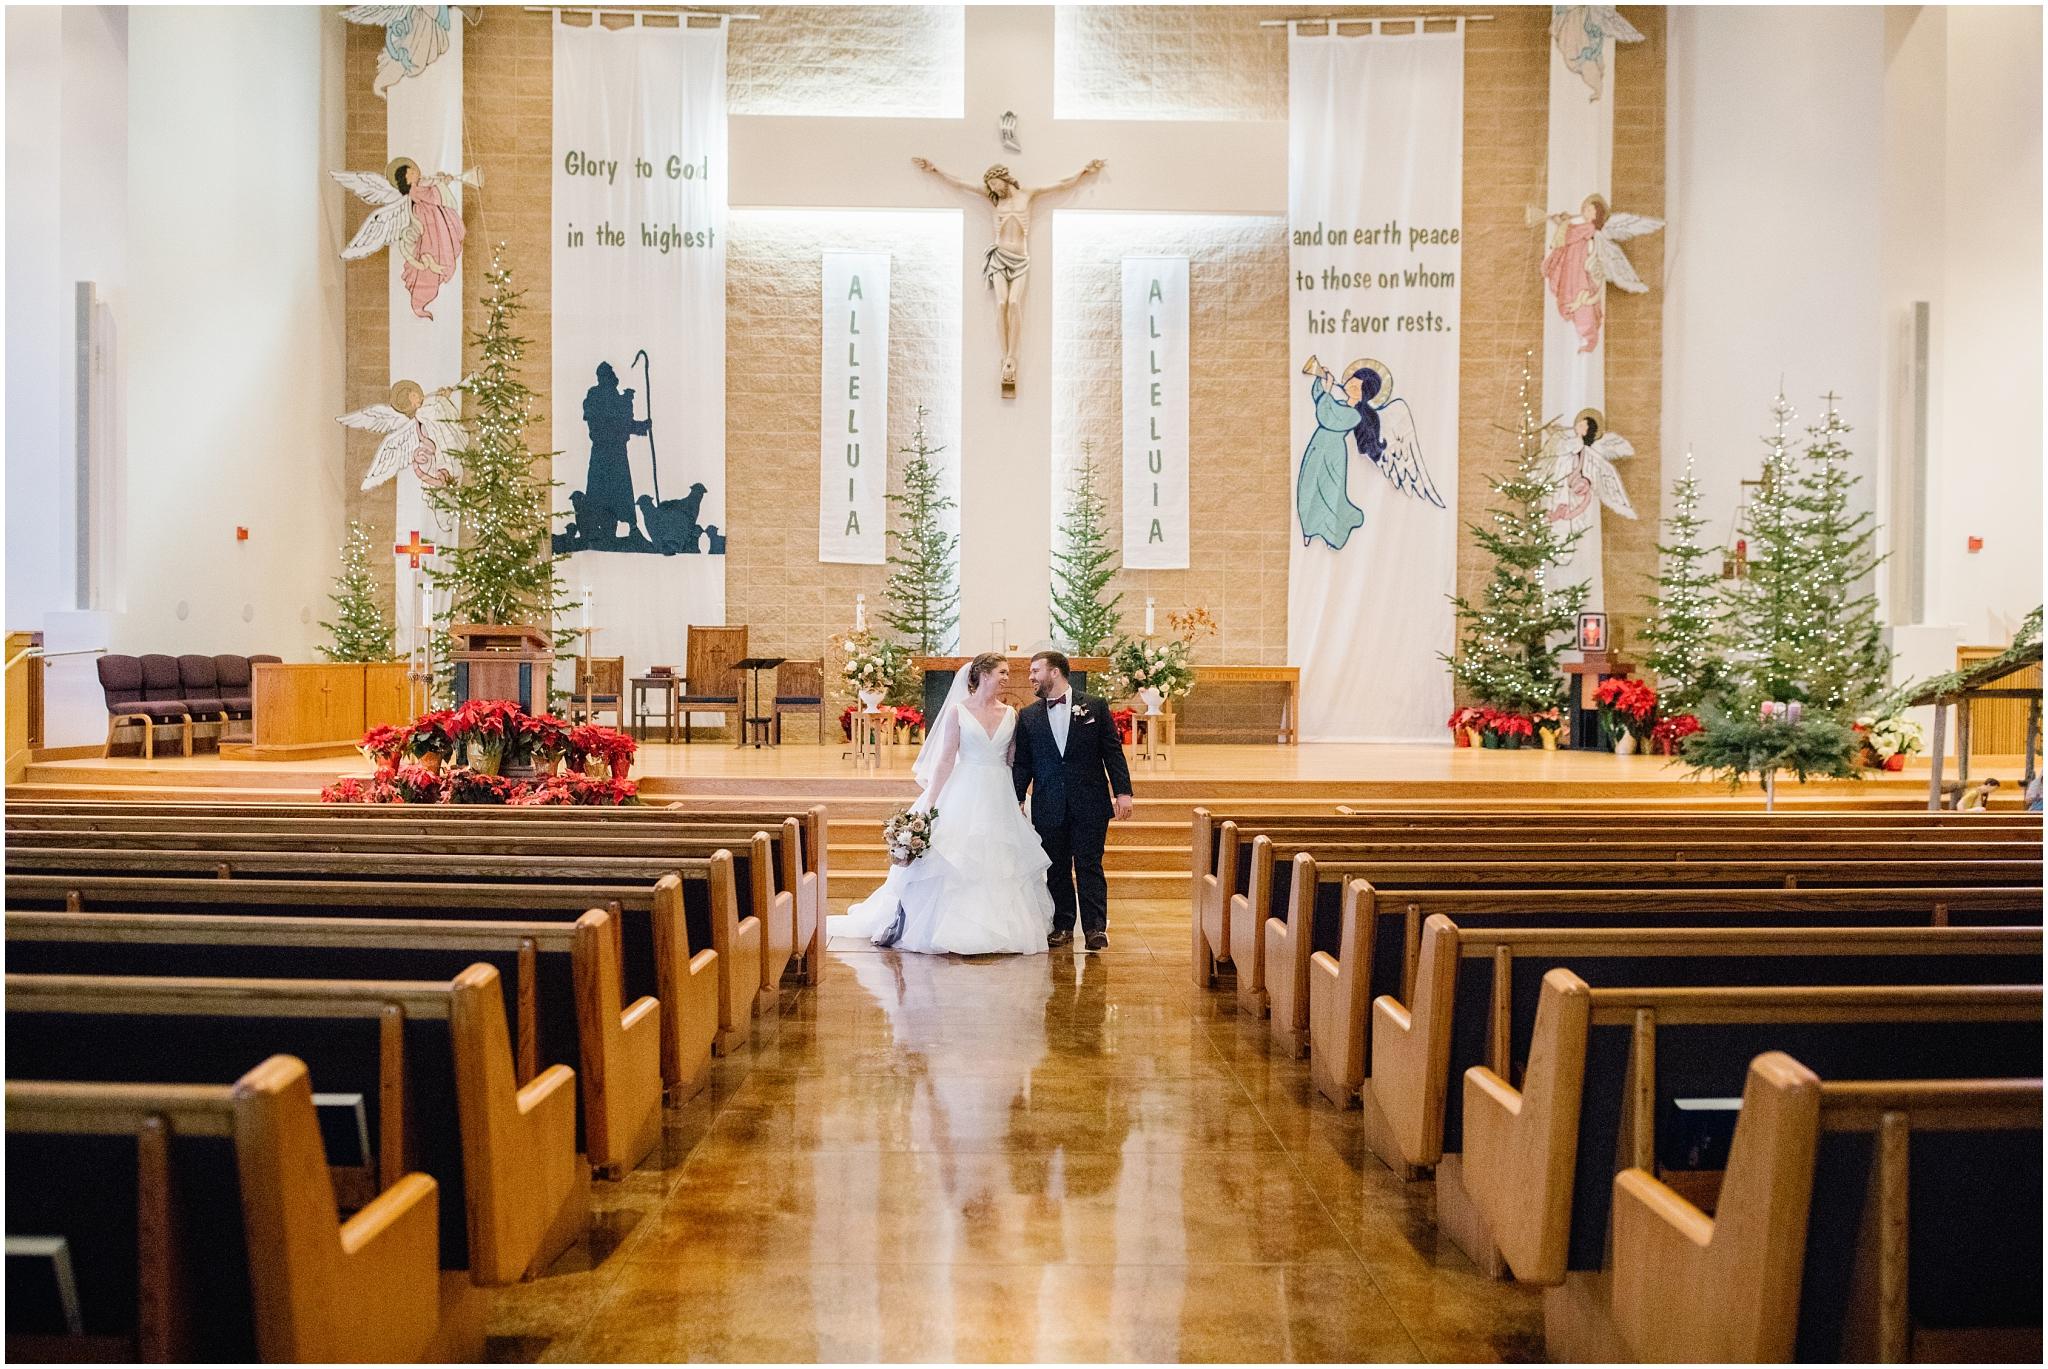 CN-Wedding-229_Lizzie-B-Imagery-Utah-Wedding-Photographer-Blessed-Sacrament-Catholic-Church-Sandy-Utah-The-Blended-Table-Salt-Lake-City.jpg